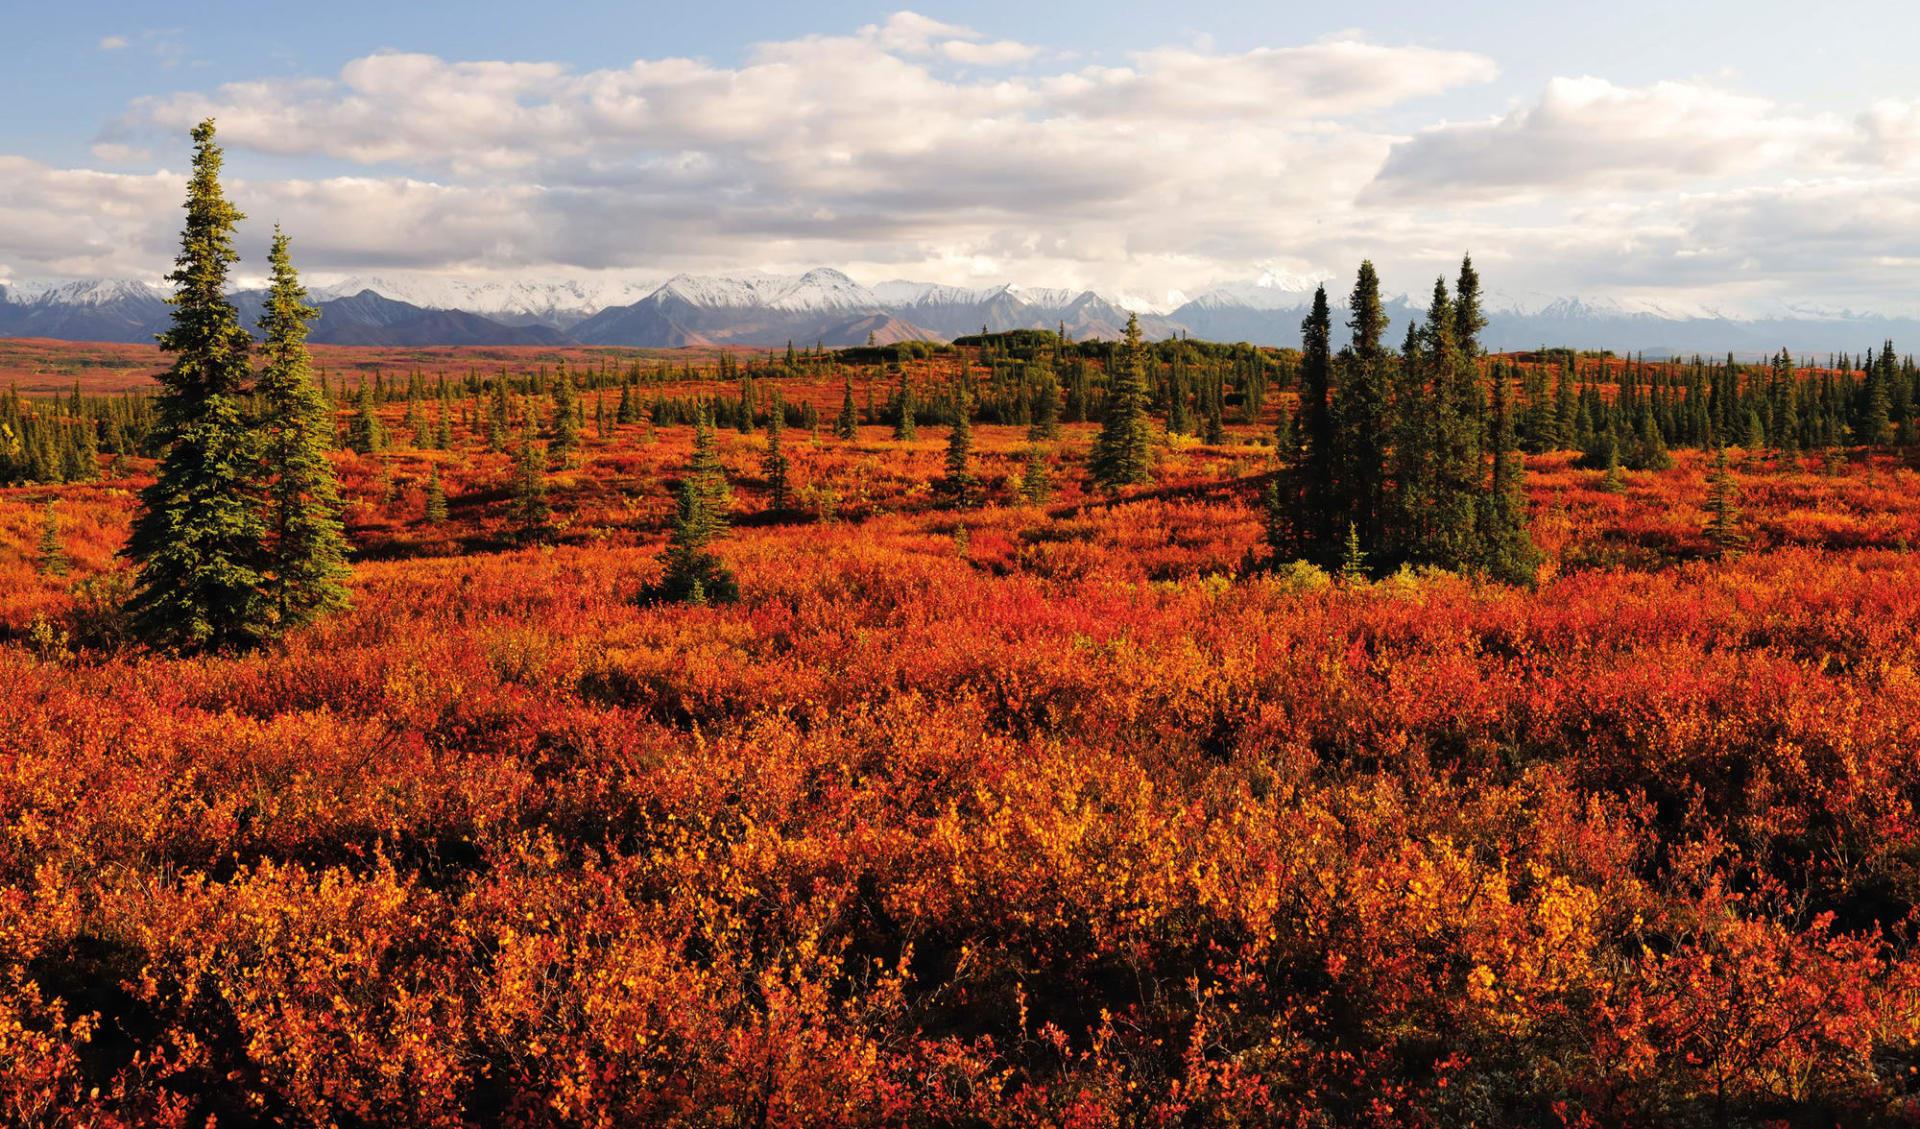 Zauberhaftes Alaska & Yukon ab Anchorage: Alaska - Denali Nationalpark - Farbige Herbsttundra mit der Alaska Range